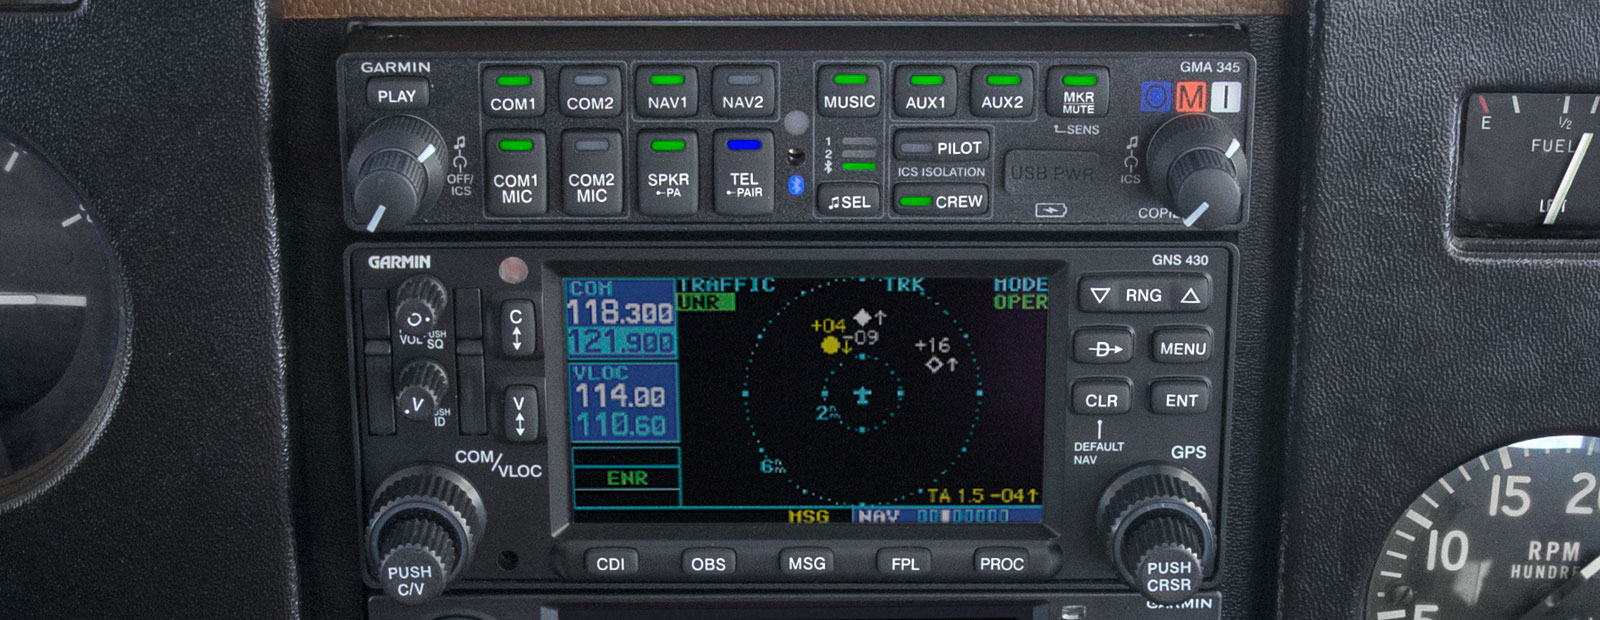 General Aviation – Audio Panels